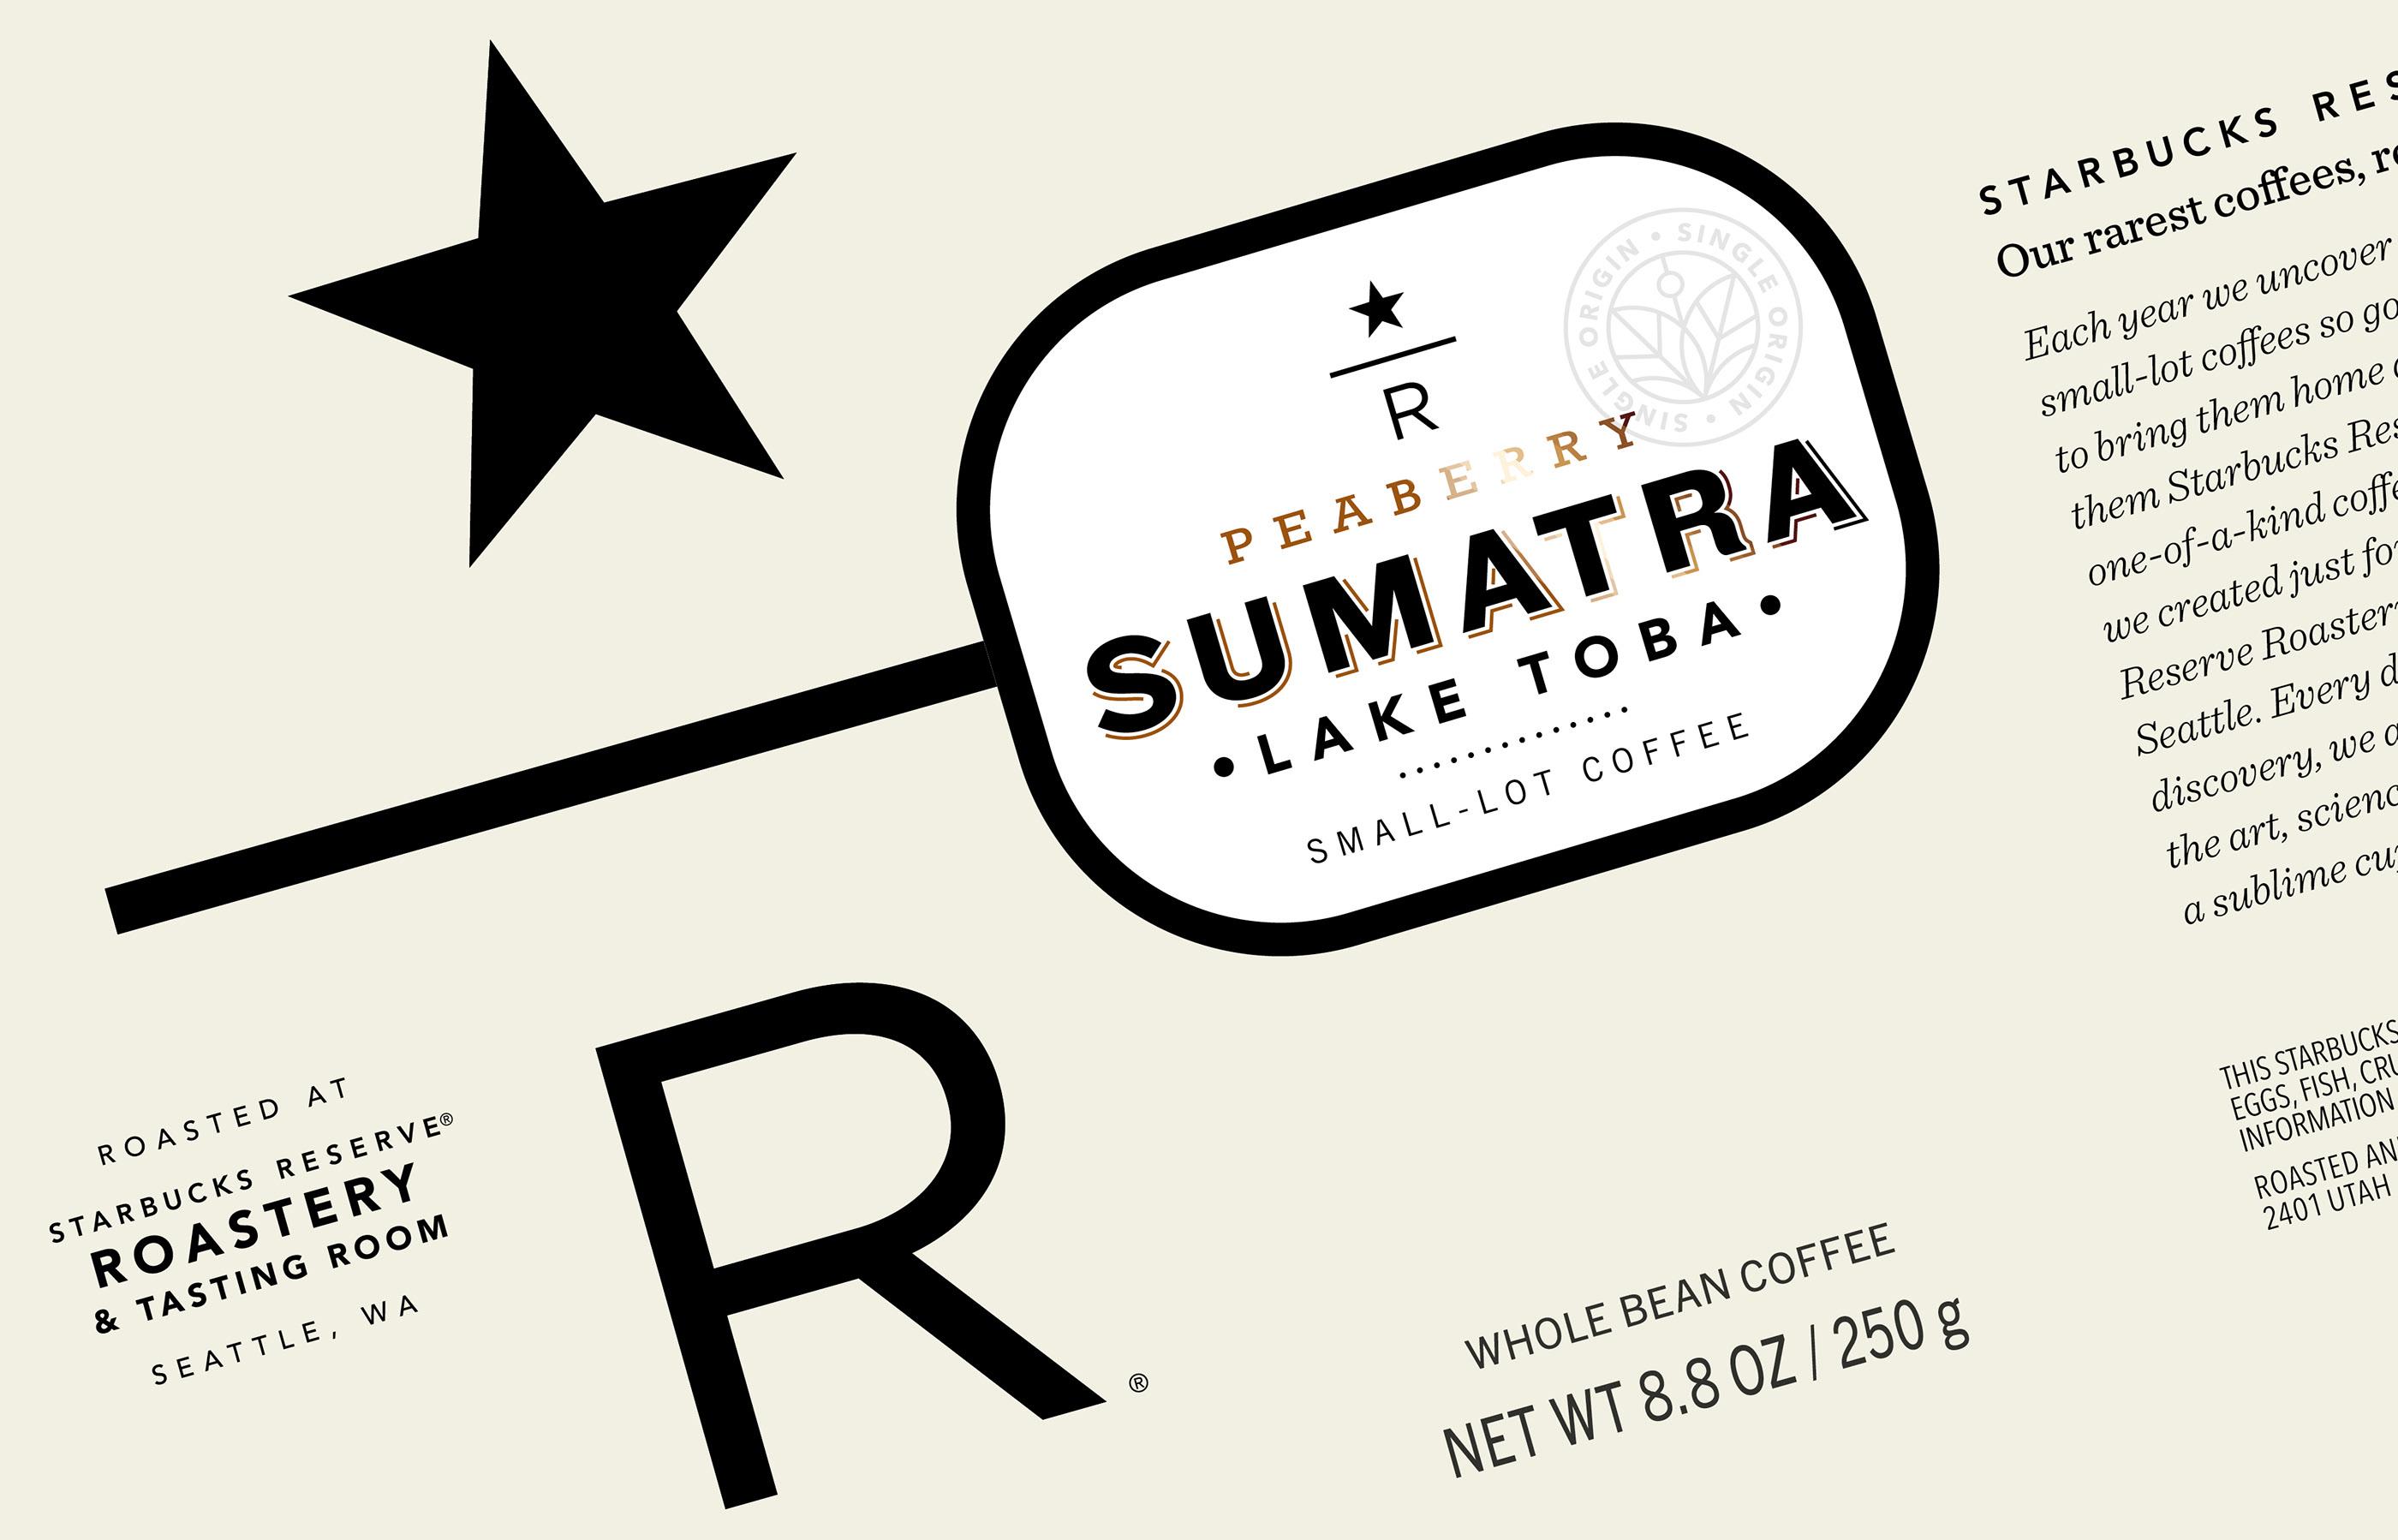 Starbucks Reserve Roastery & Tasting Room on Behance.